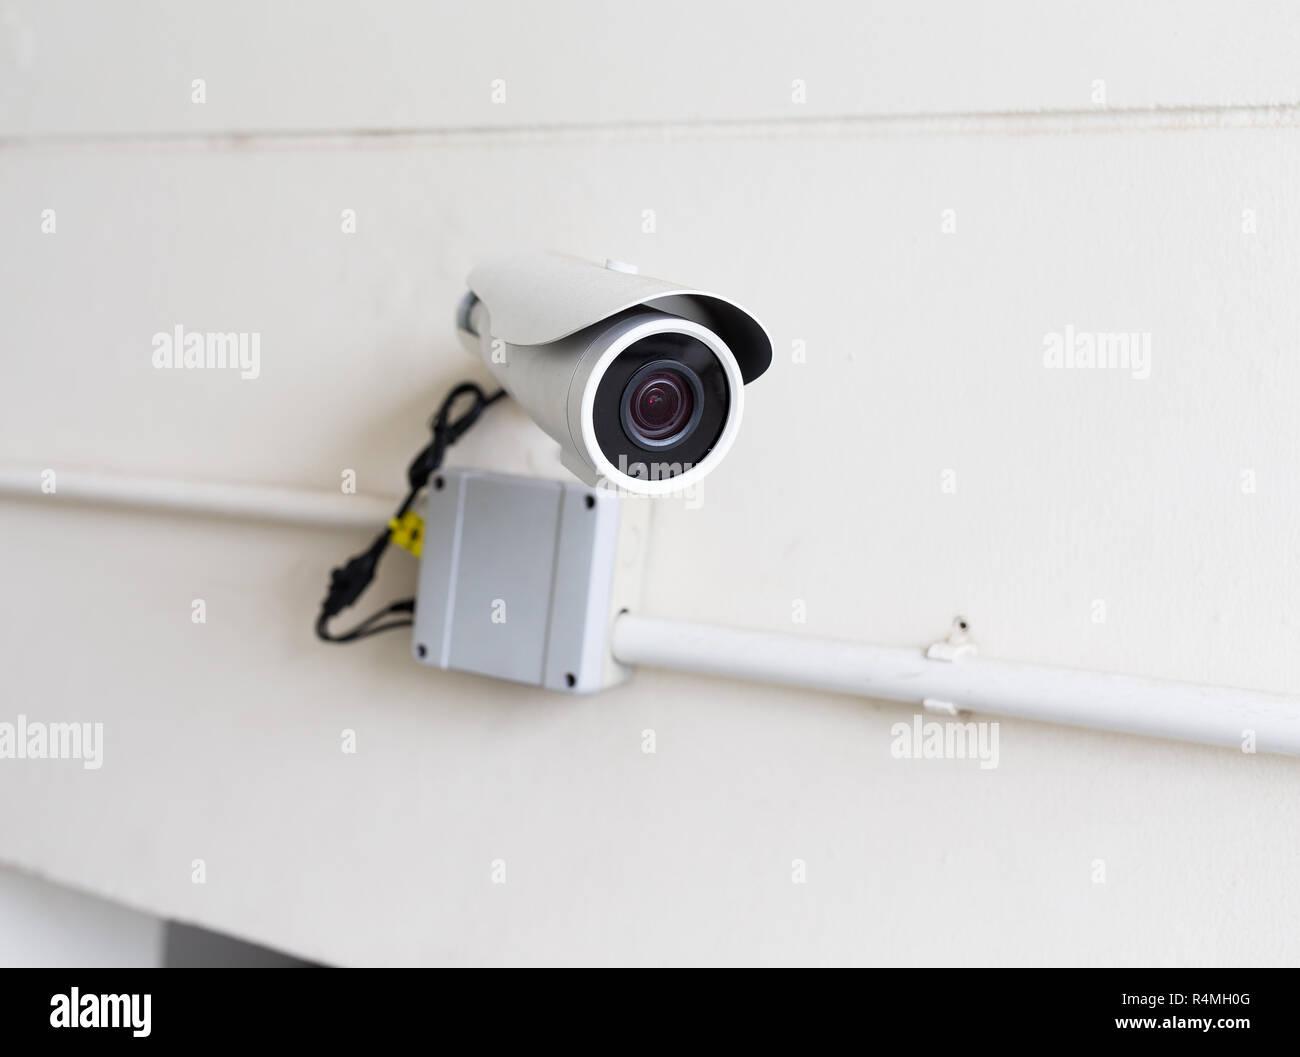 Wall mount surveillance camera - Stock Image